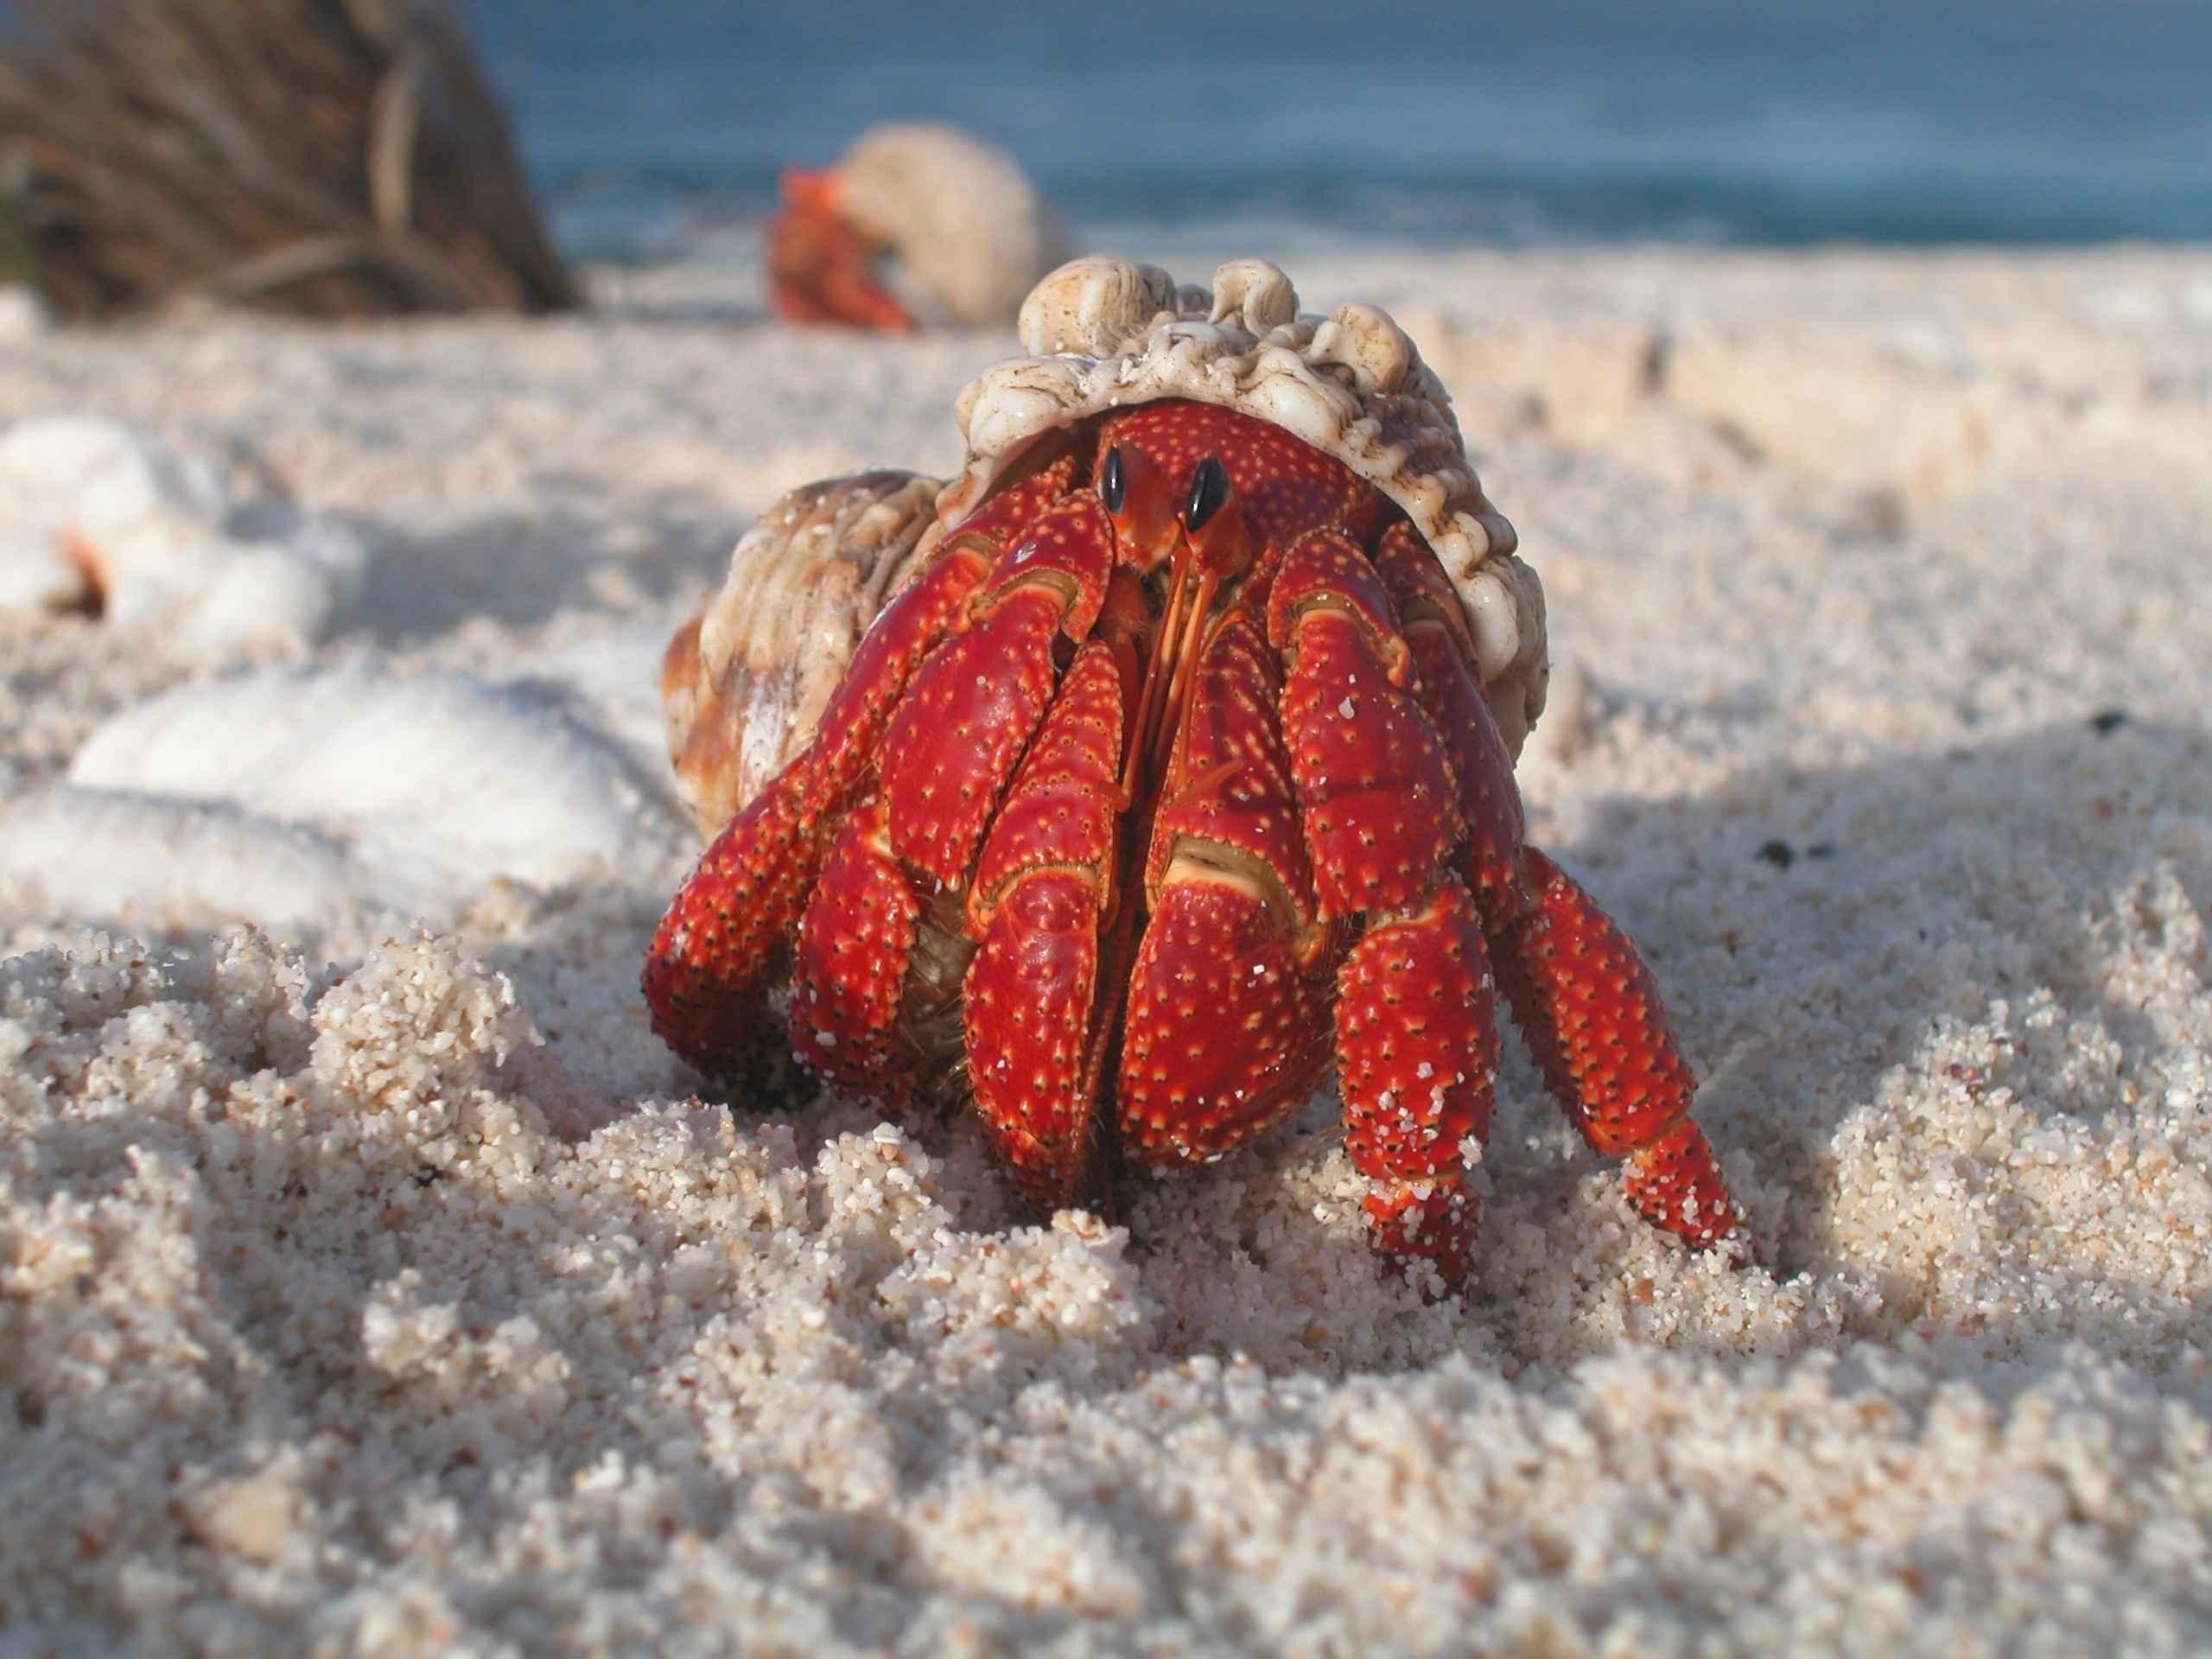 Crab on the Beach, Animal, Beach, Crab, Fish, HQ Photo